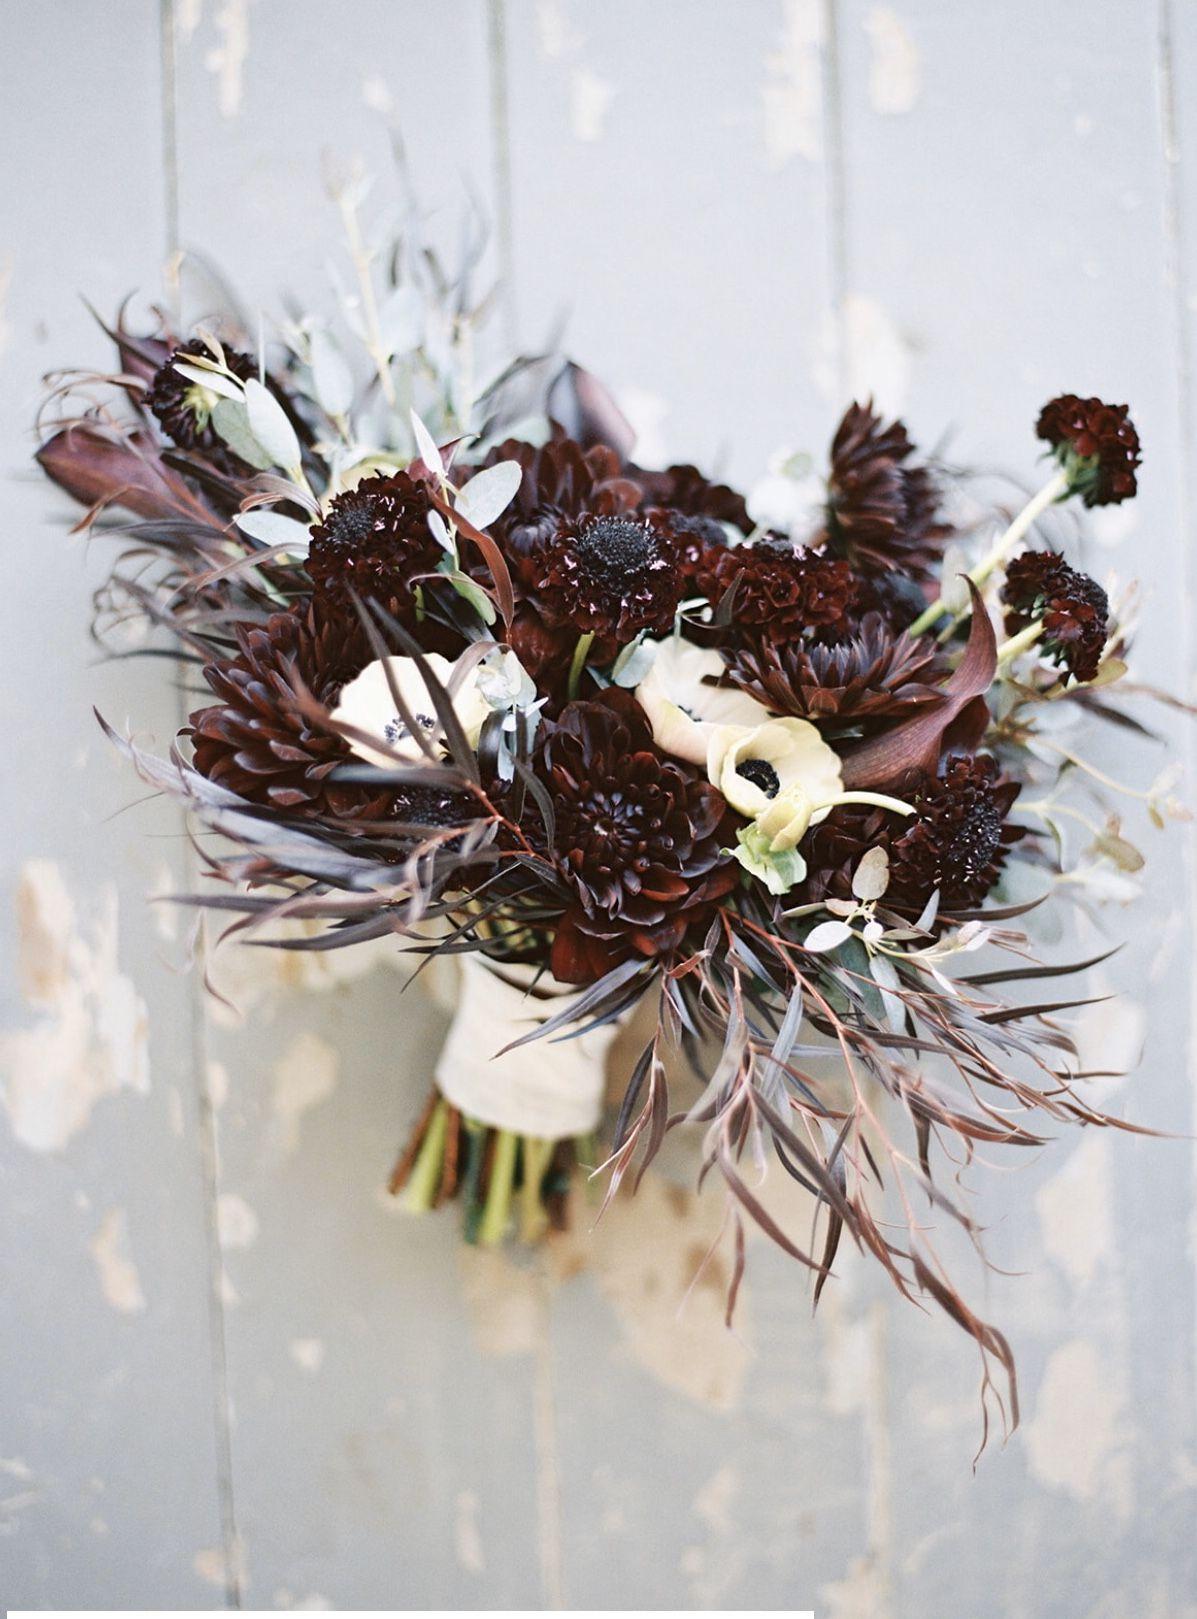 Black Beauty Bouquet